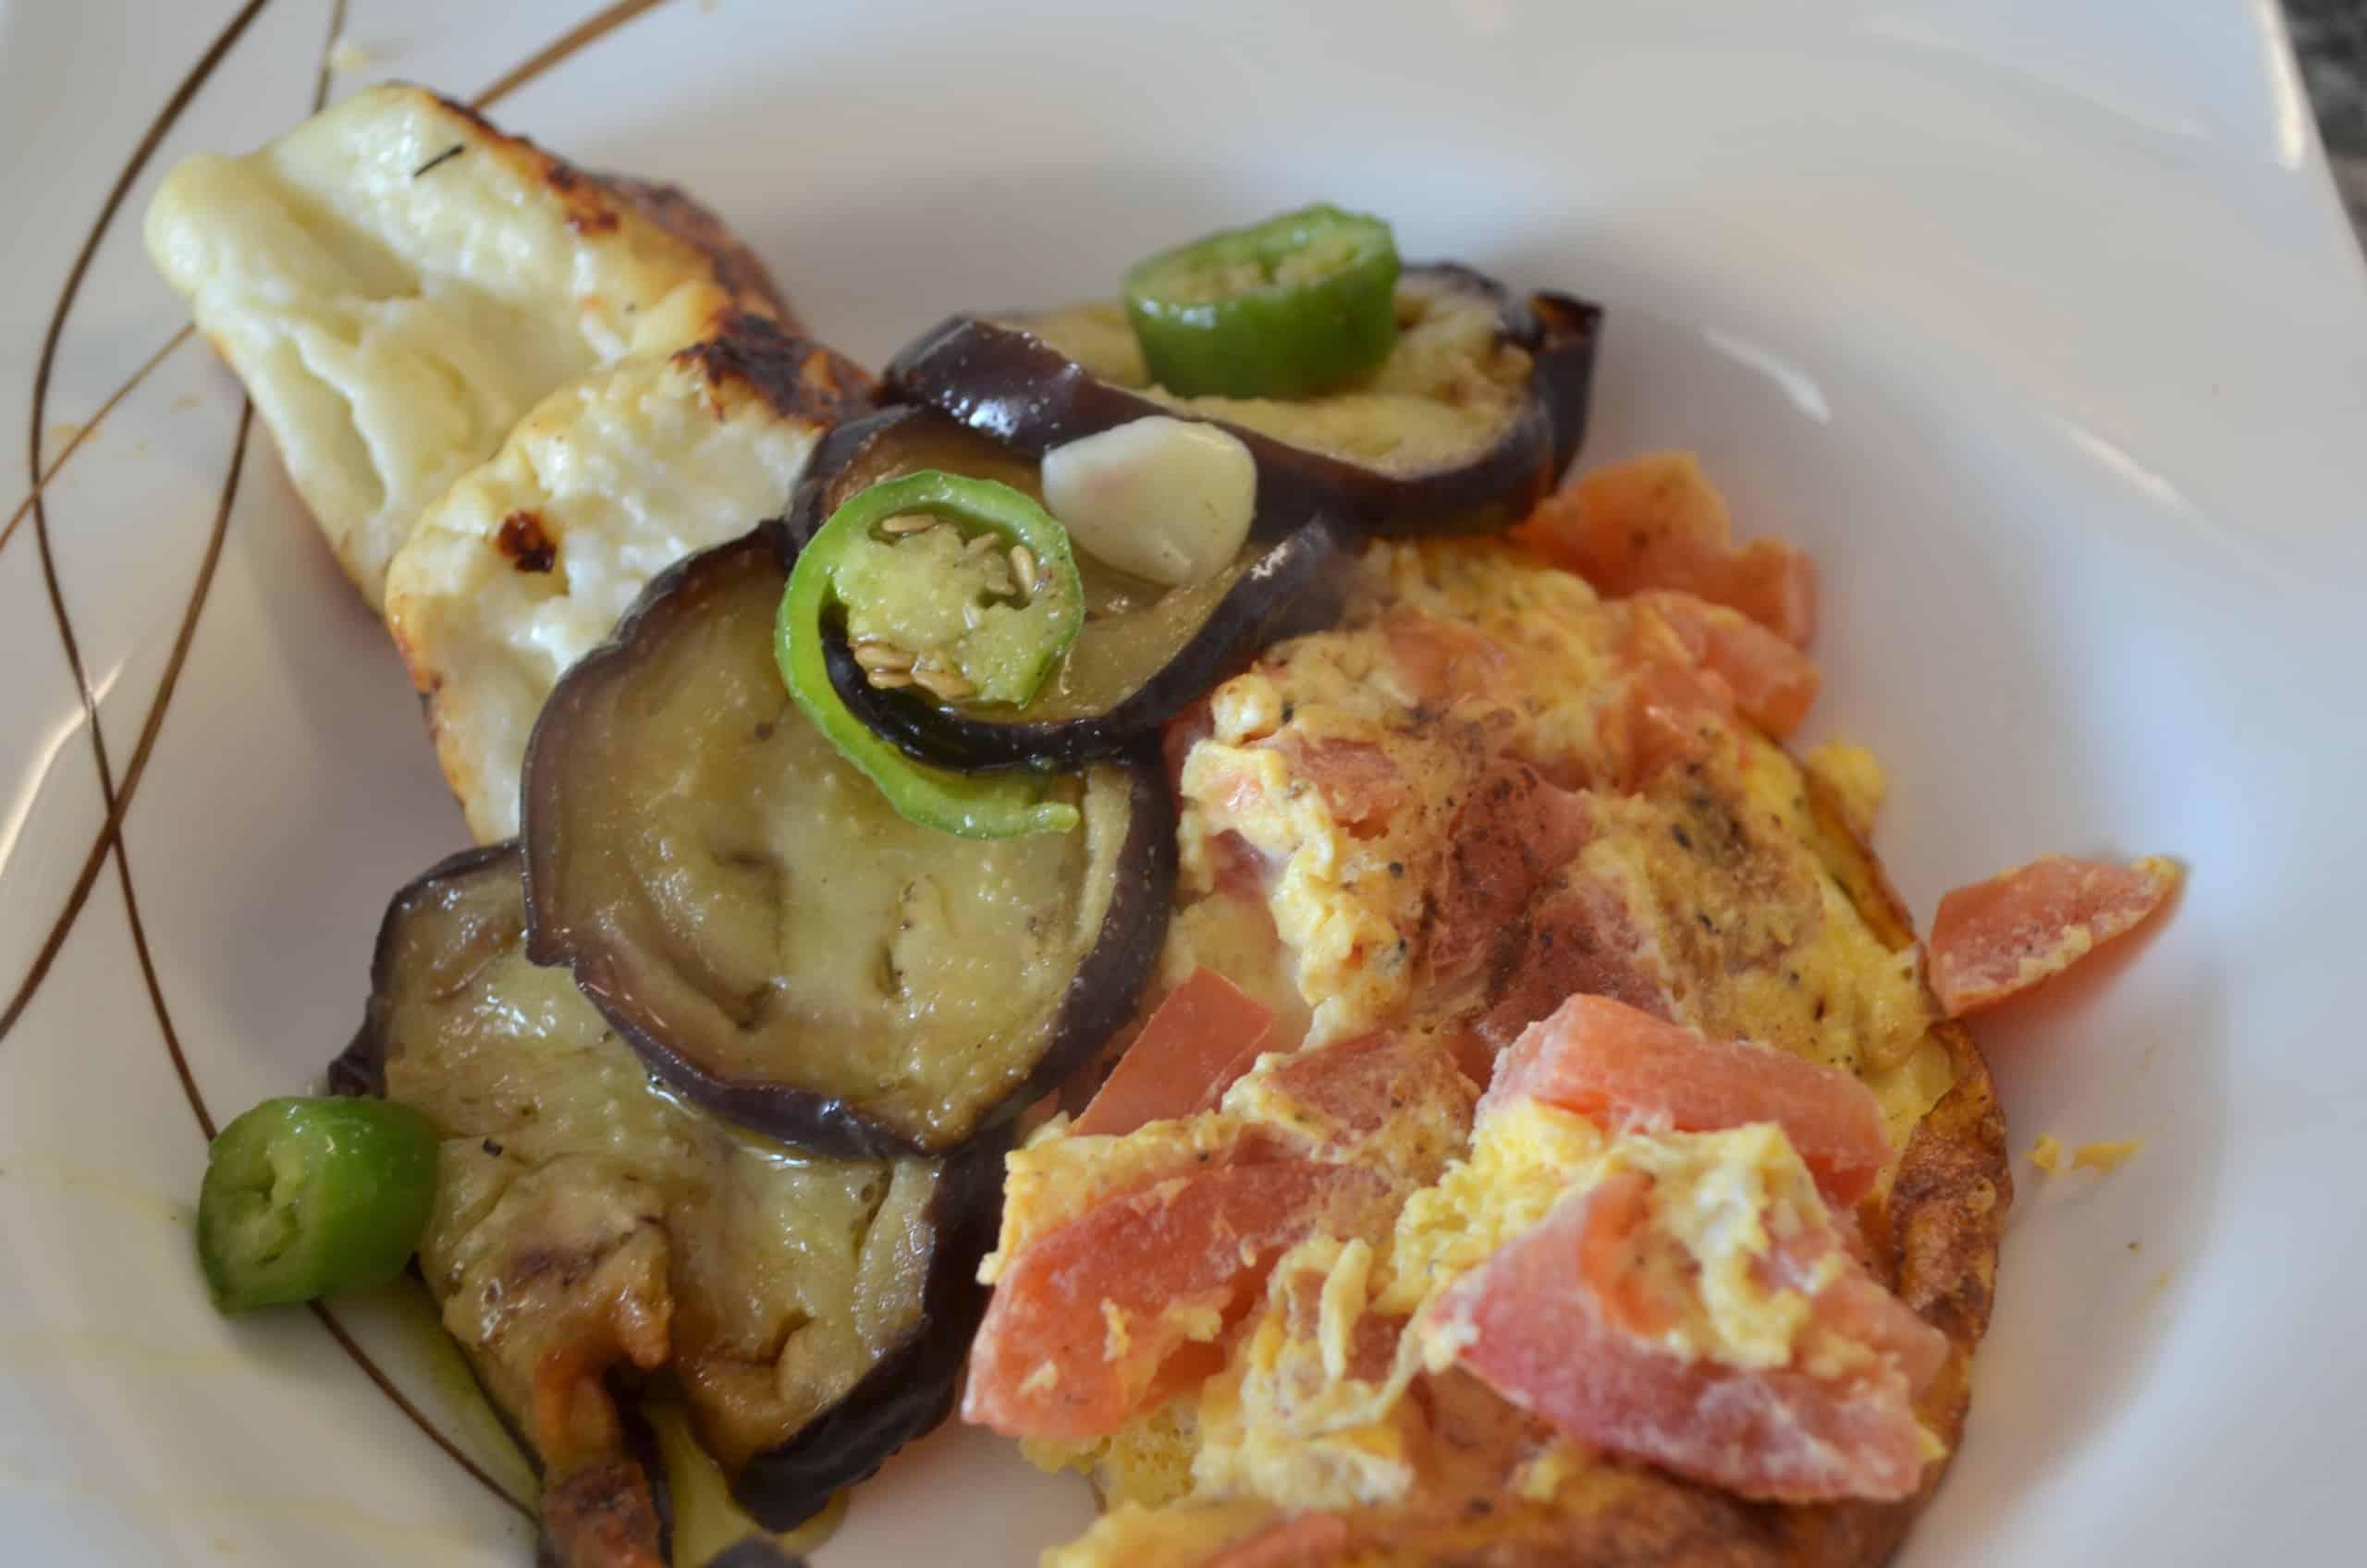 Tomaten Omelette, Haloumi Käse und eingelegte Auberginen